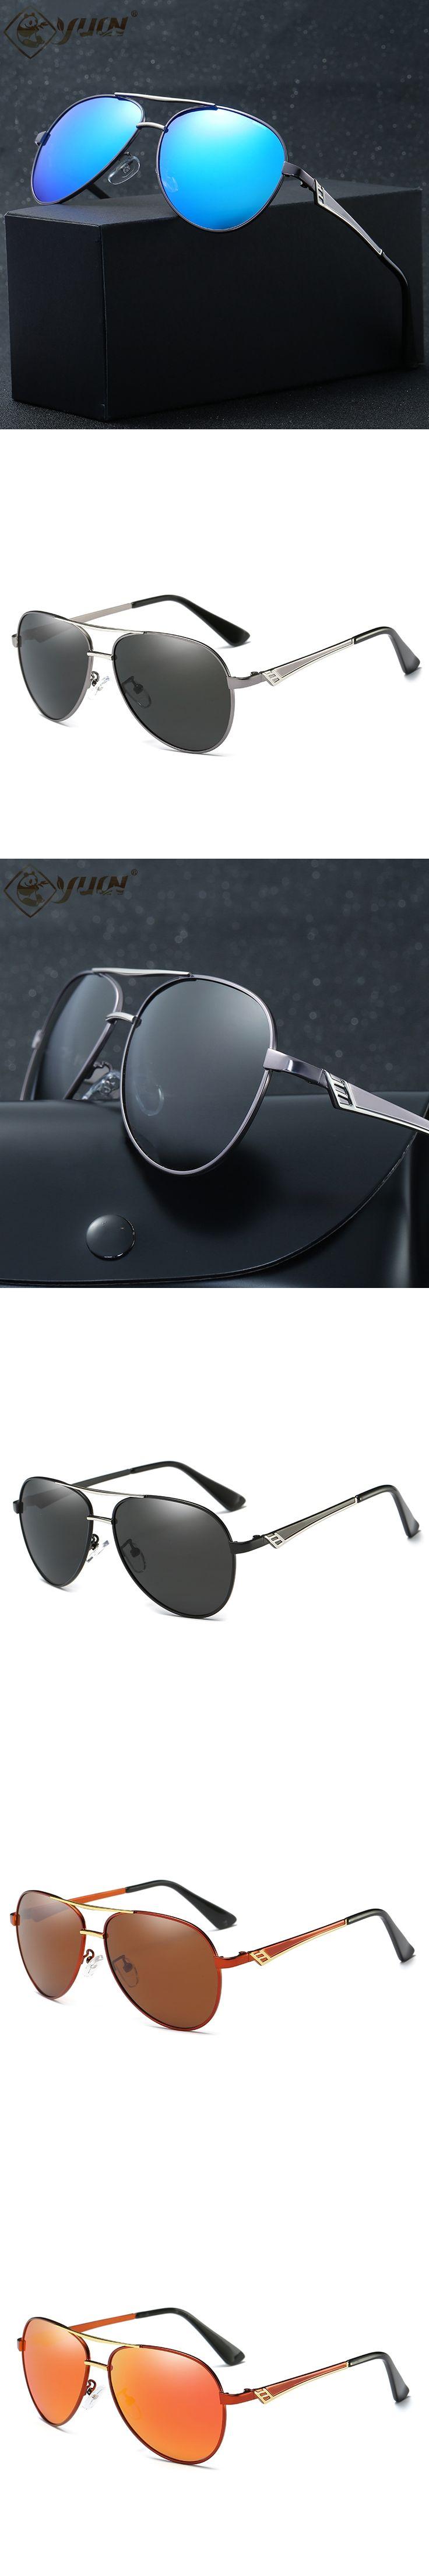 YUW brand design sunglasses alloy frame polarized driving sun glasses for men Oculos De Sol 390